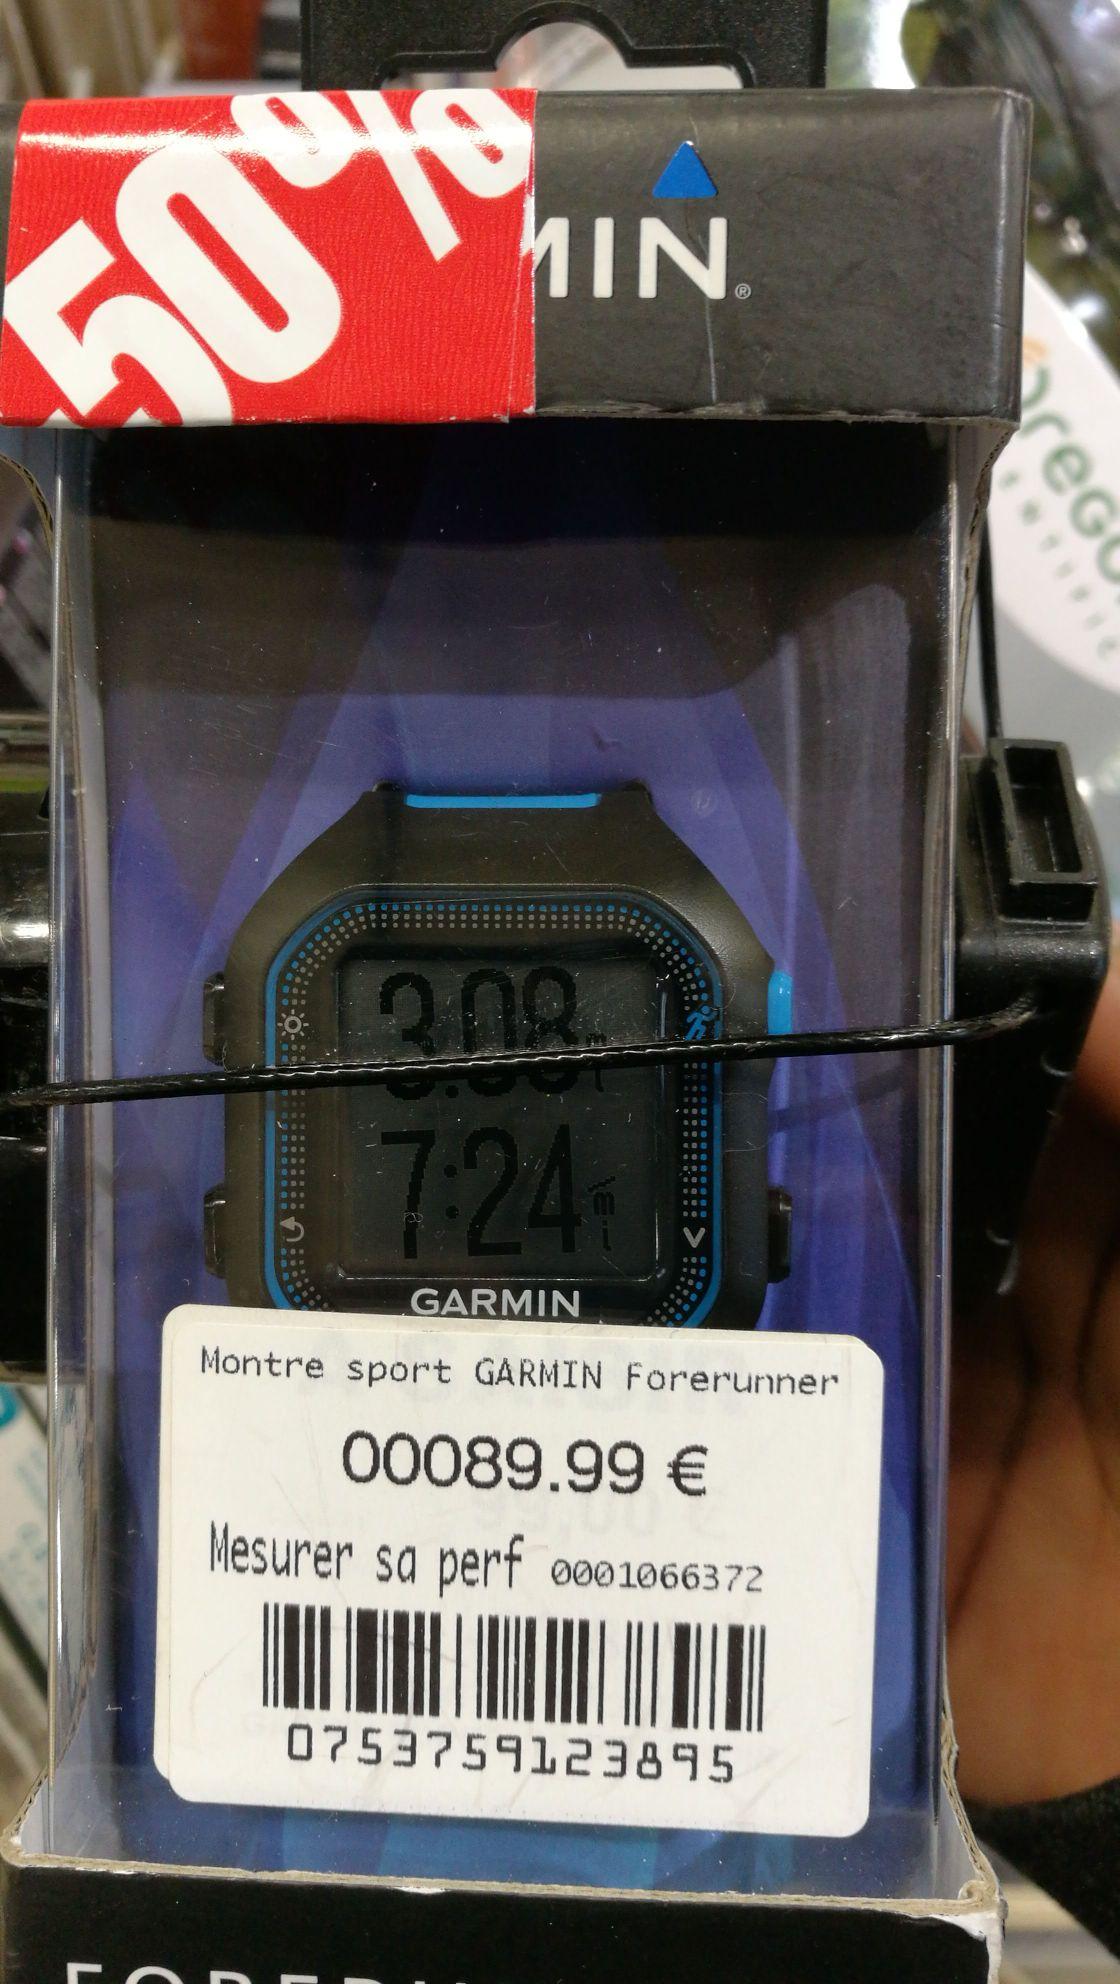 Montre GPS Garmin Forerunner 25 - Montévrain (77)